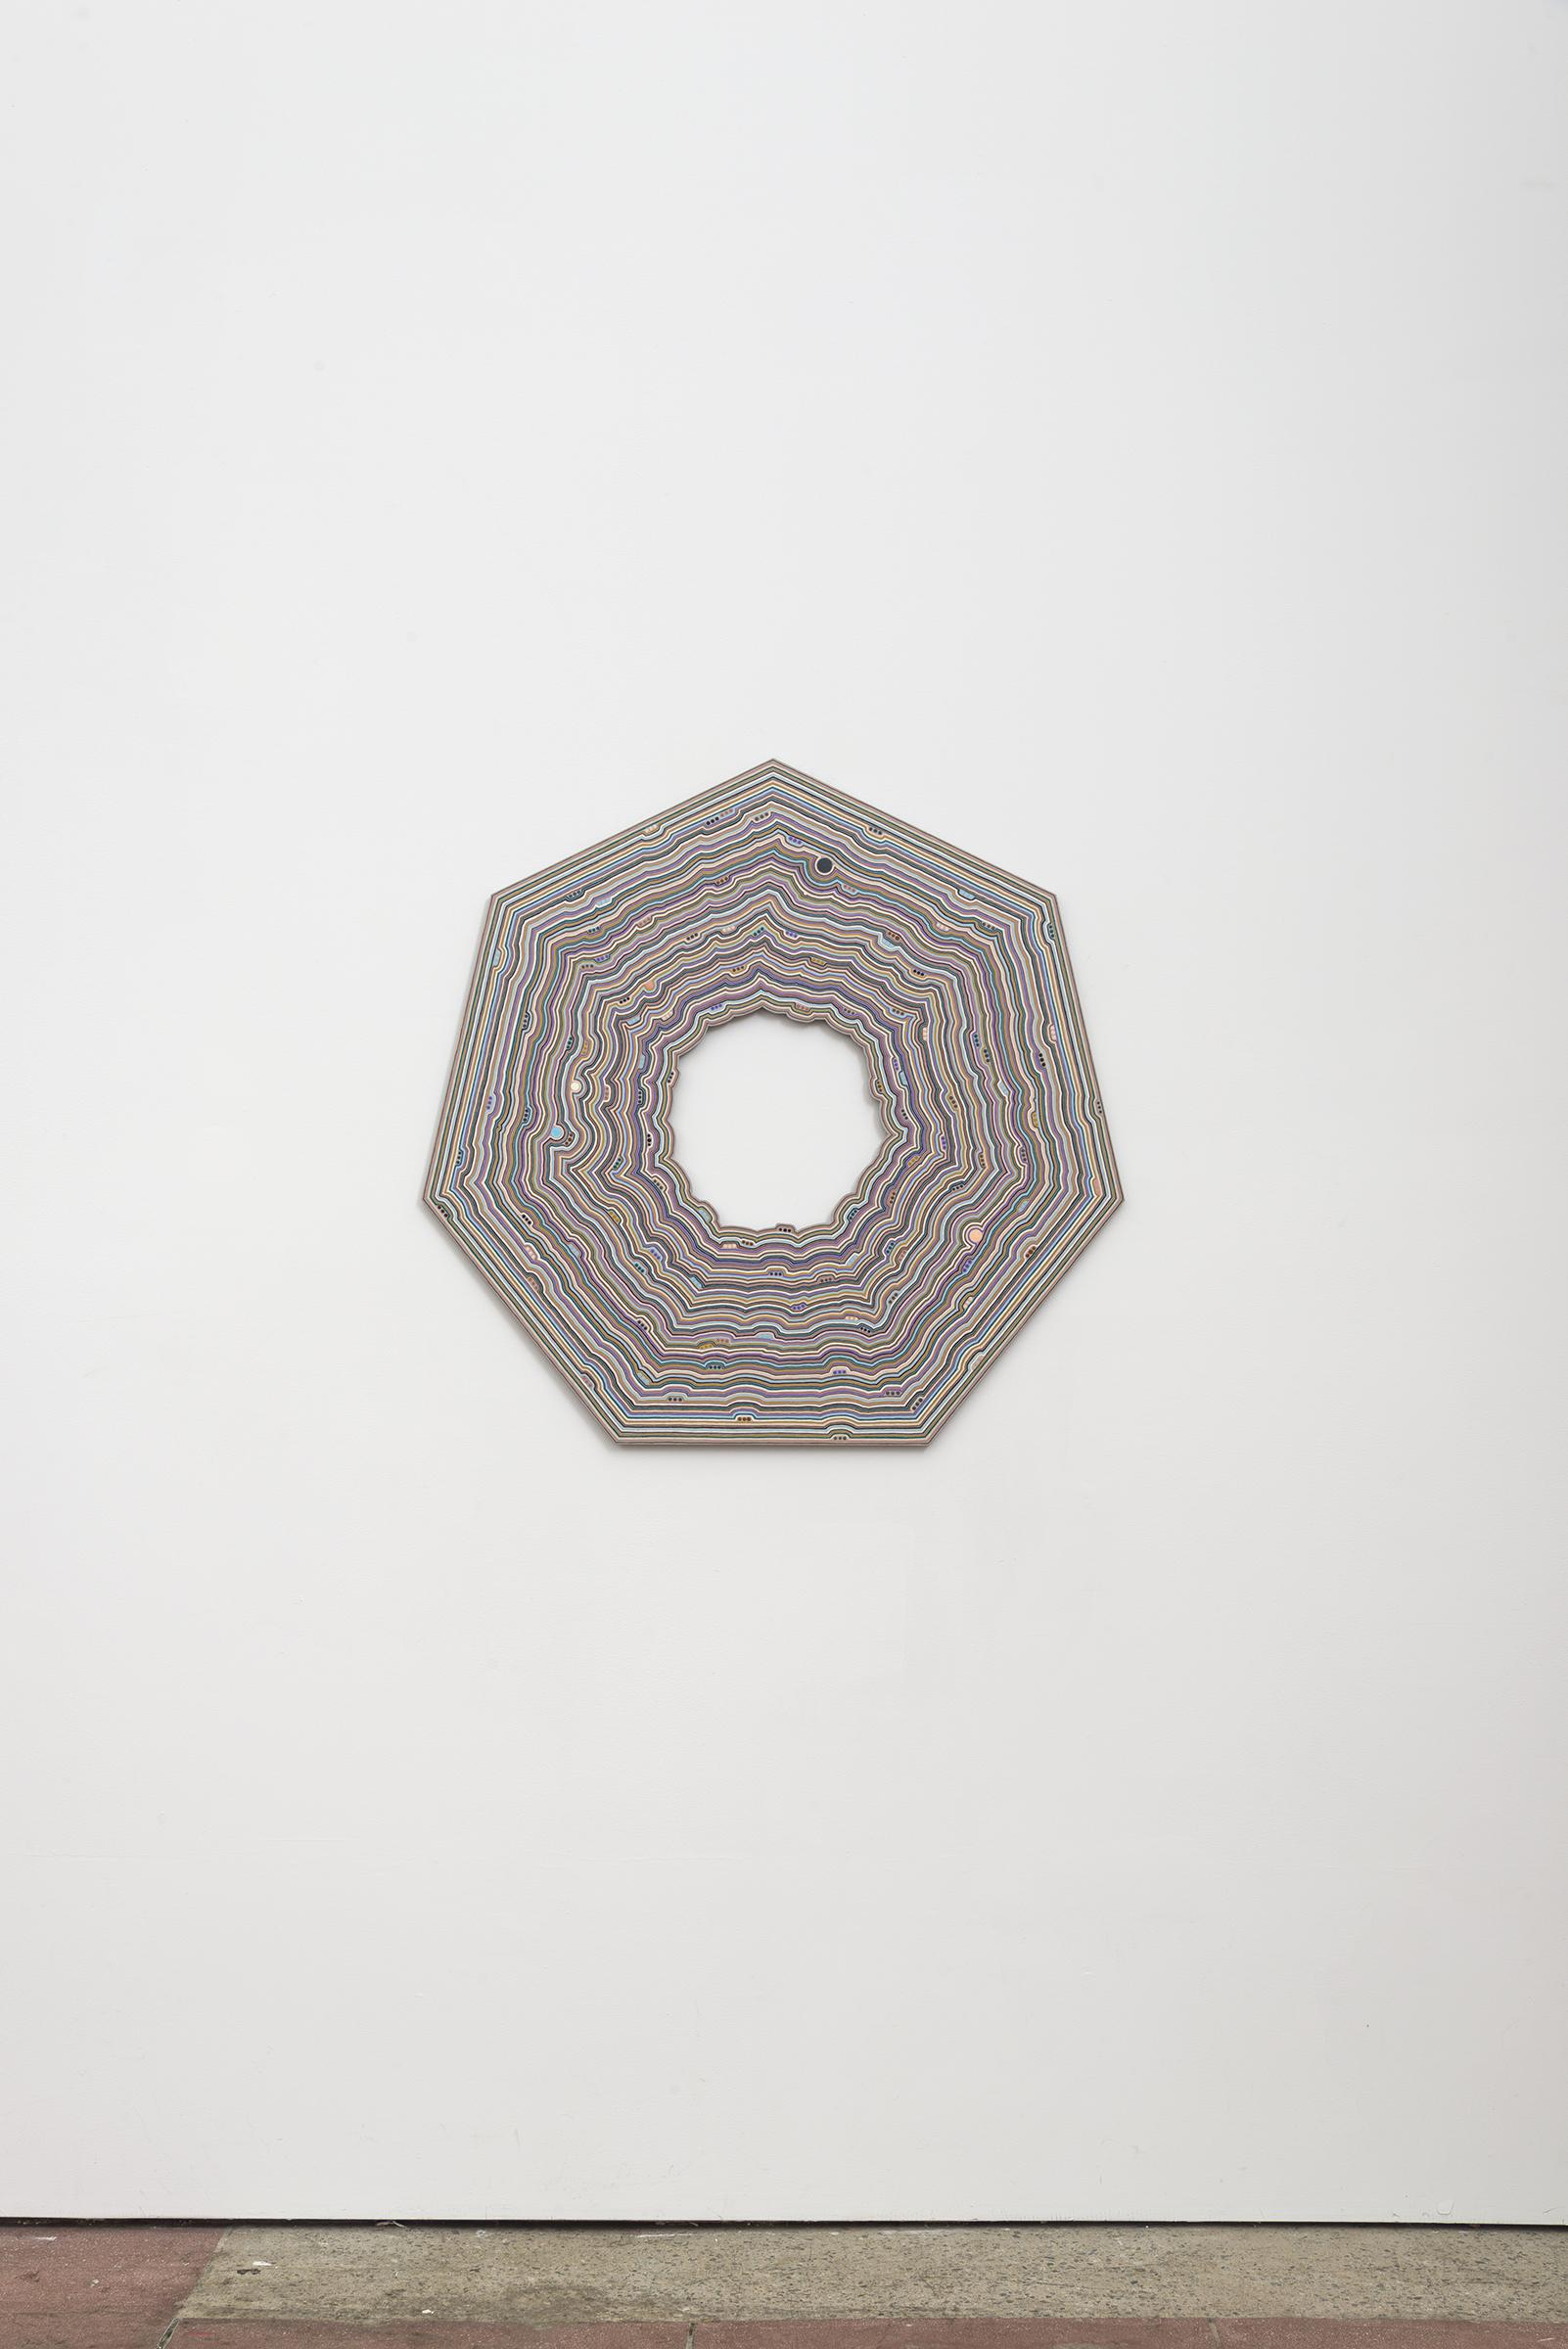 Roland Thompson, Orbit Swarm , 2016, acrylic on aluminum, 34 x 34 in